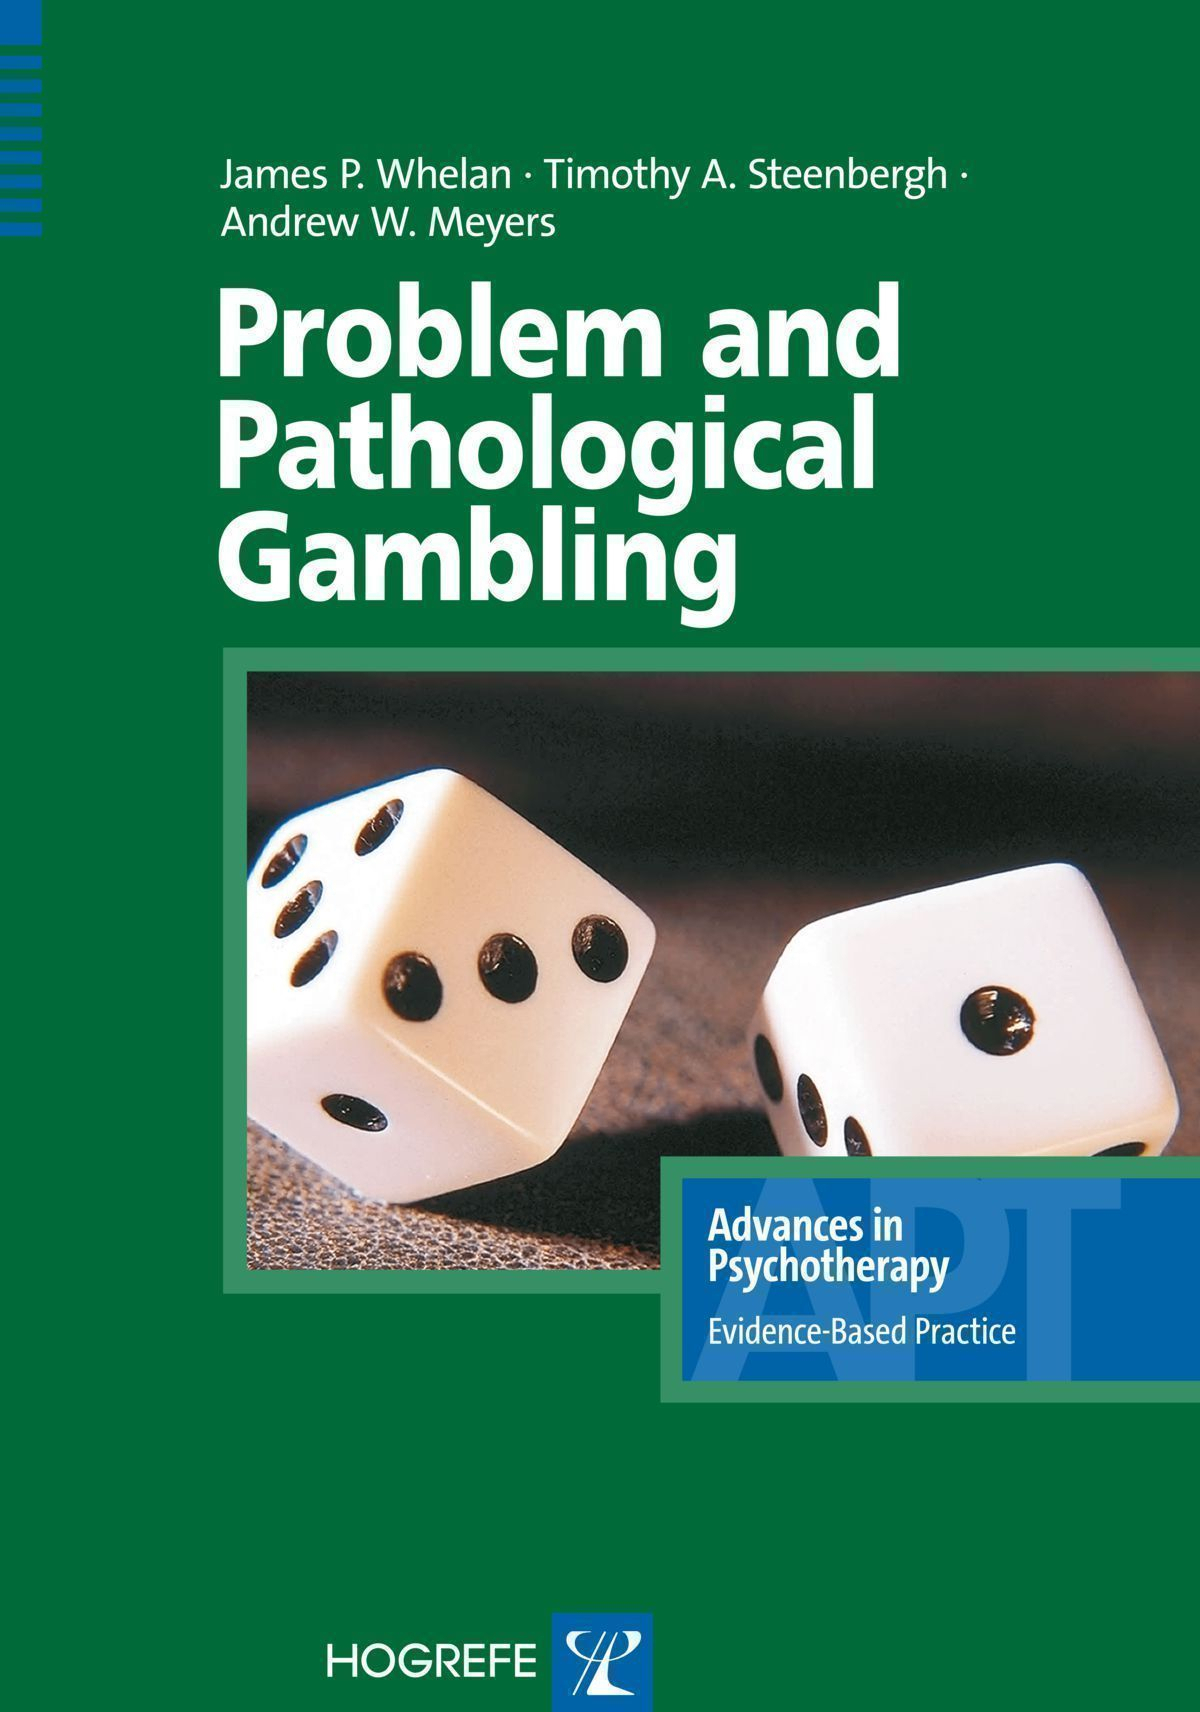 Problem and Pathological Gambling